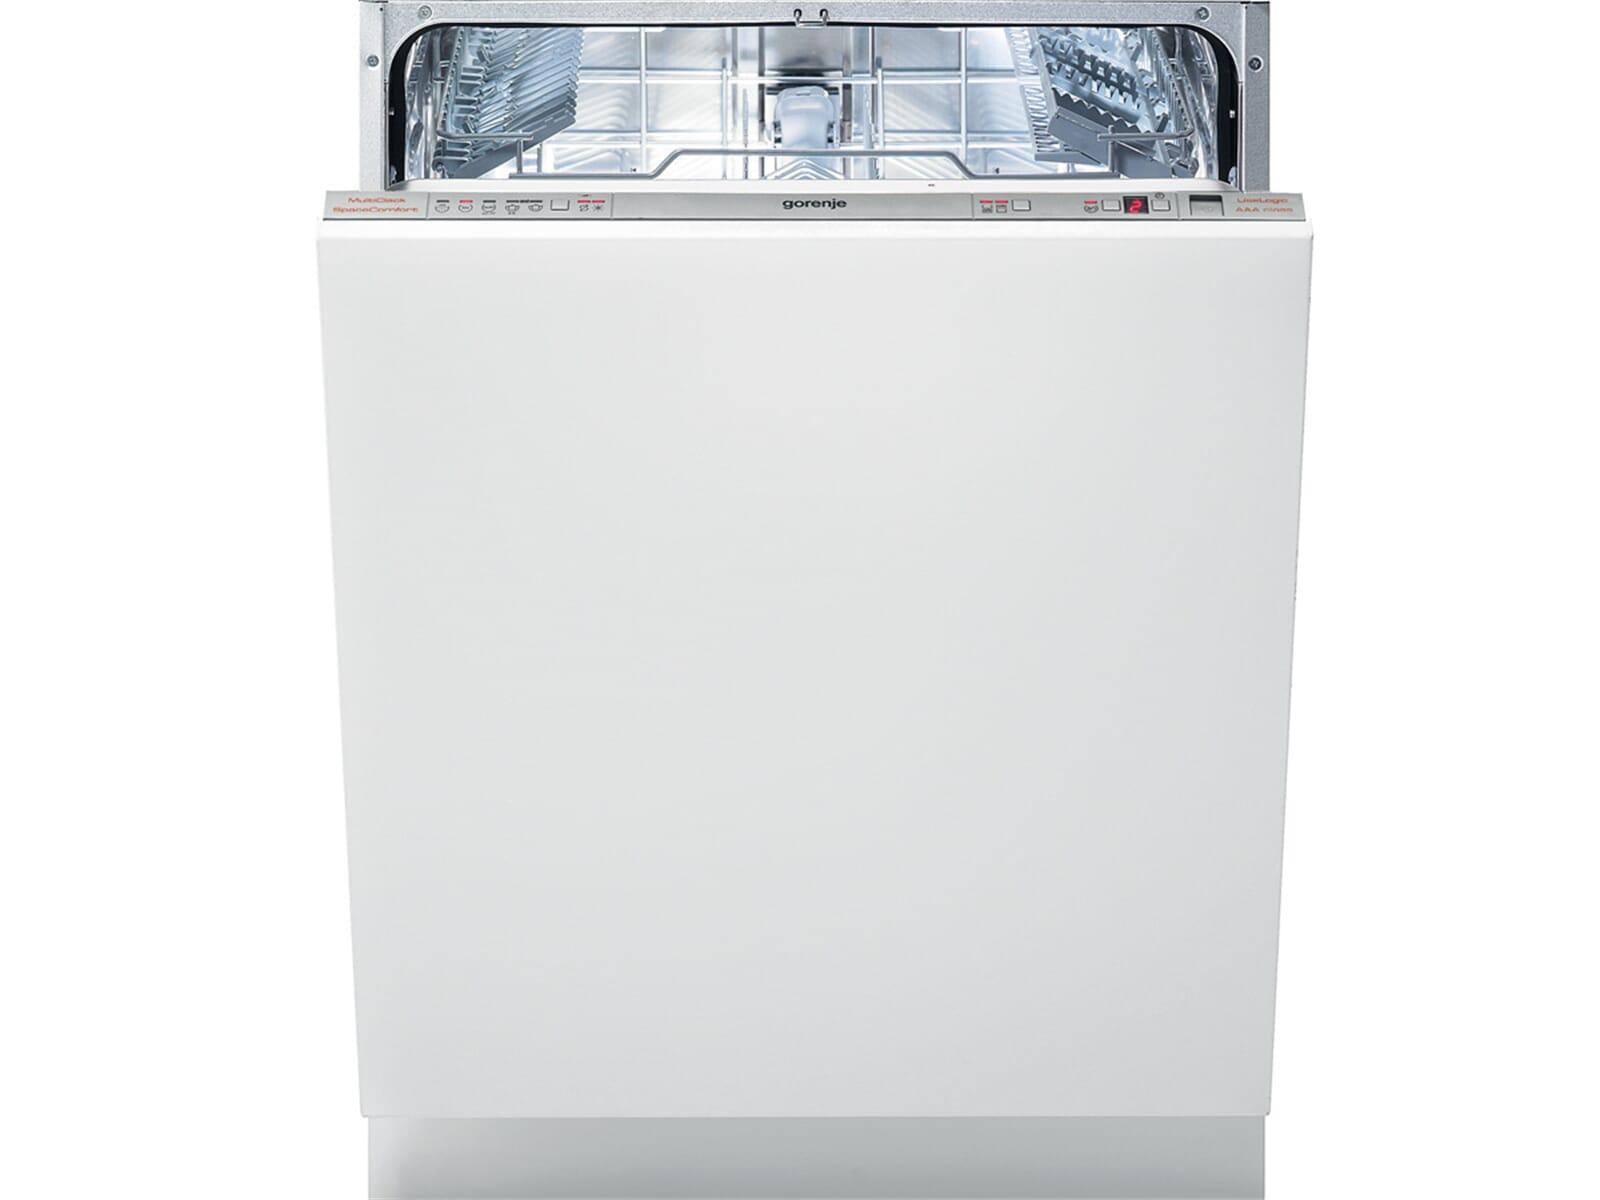 Gorenje Kühlschrank Xxl : Gorenje gv xv vollintegrierbarer einbaugeschirrspüler xxl